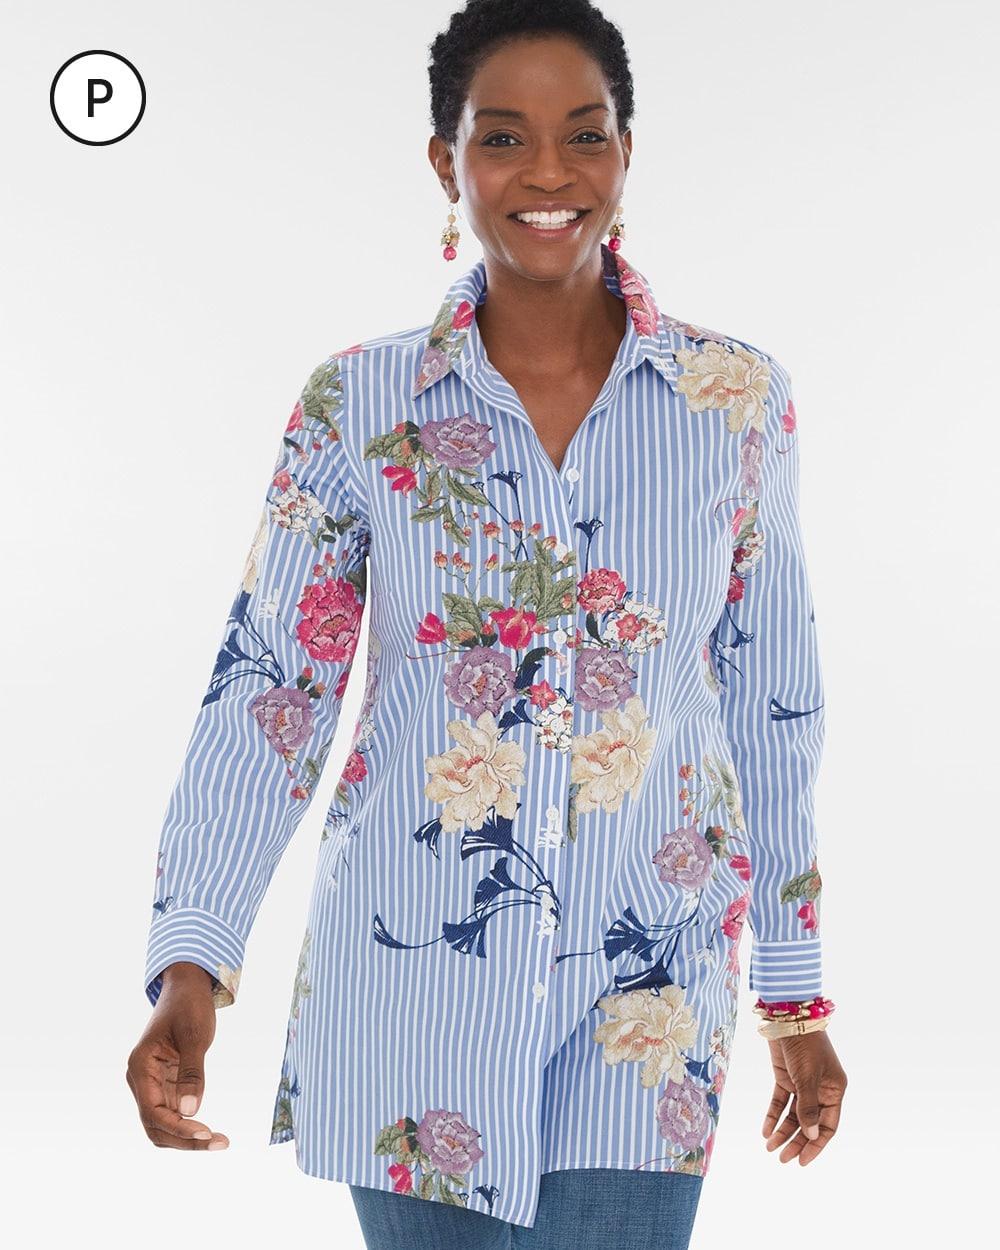 19ad8f2f687 Petite Cotton Floral Striped Shirt